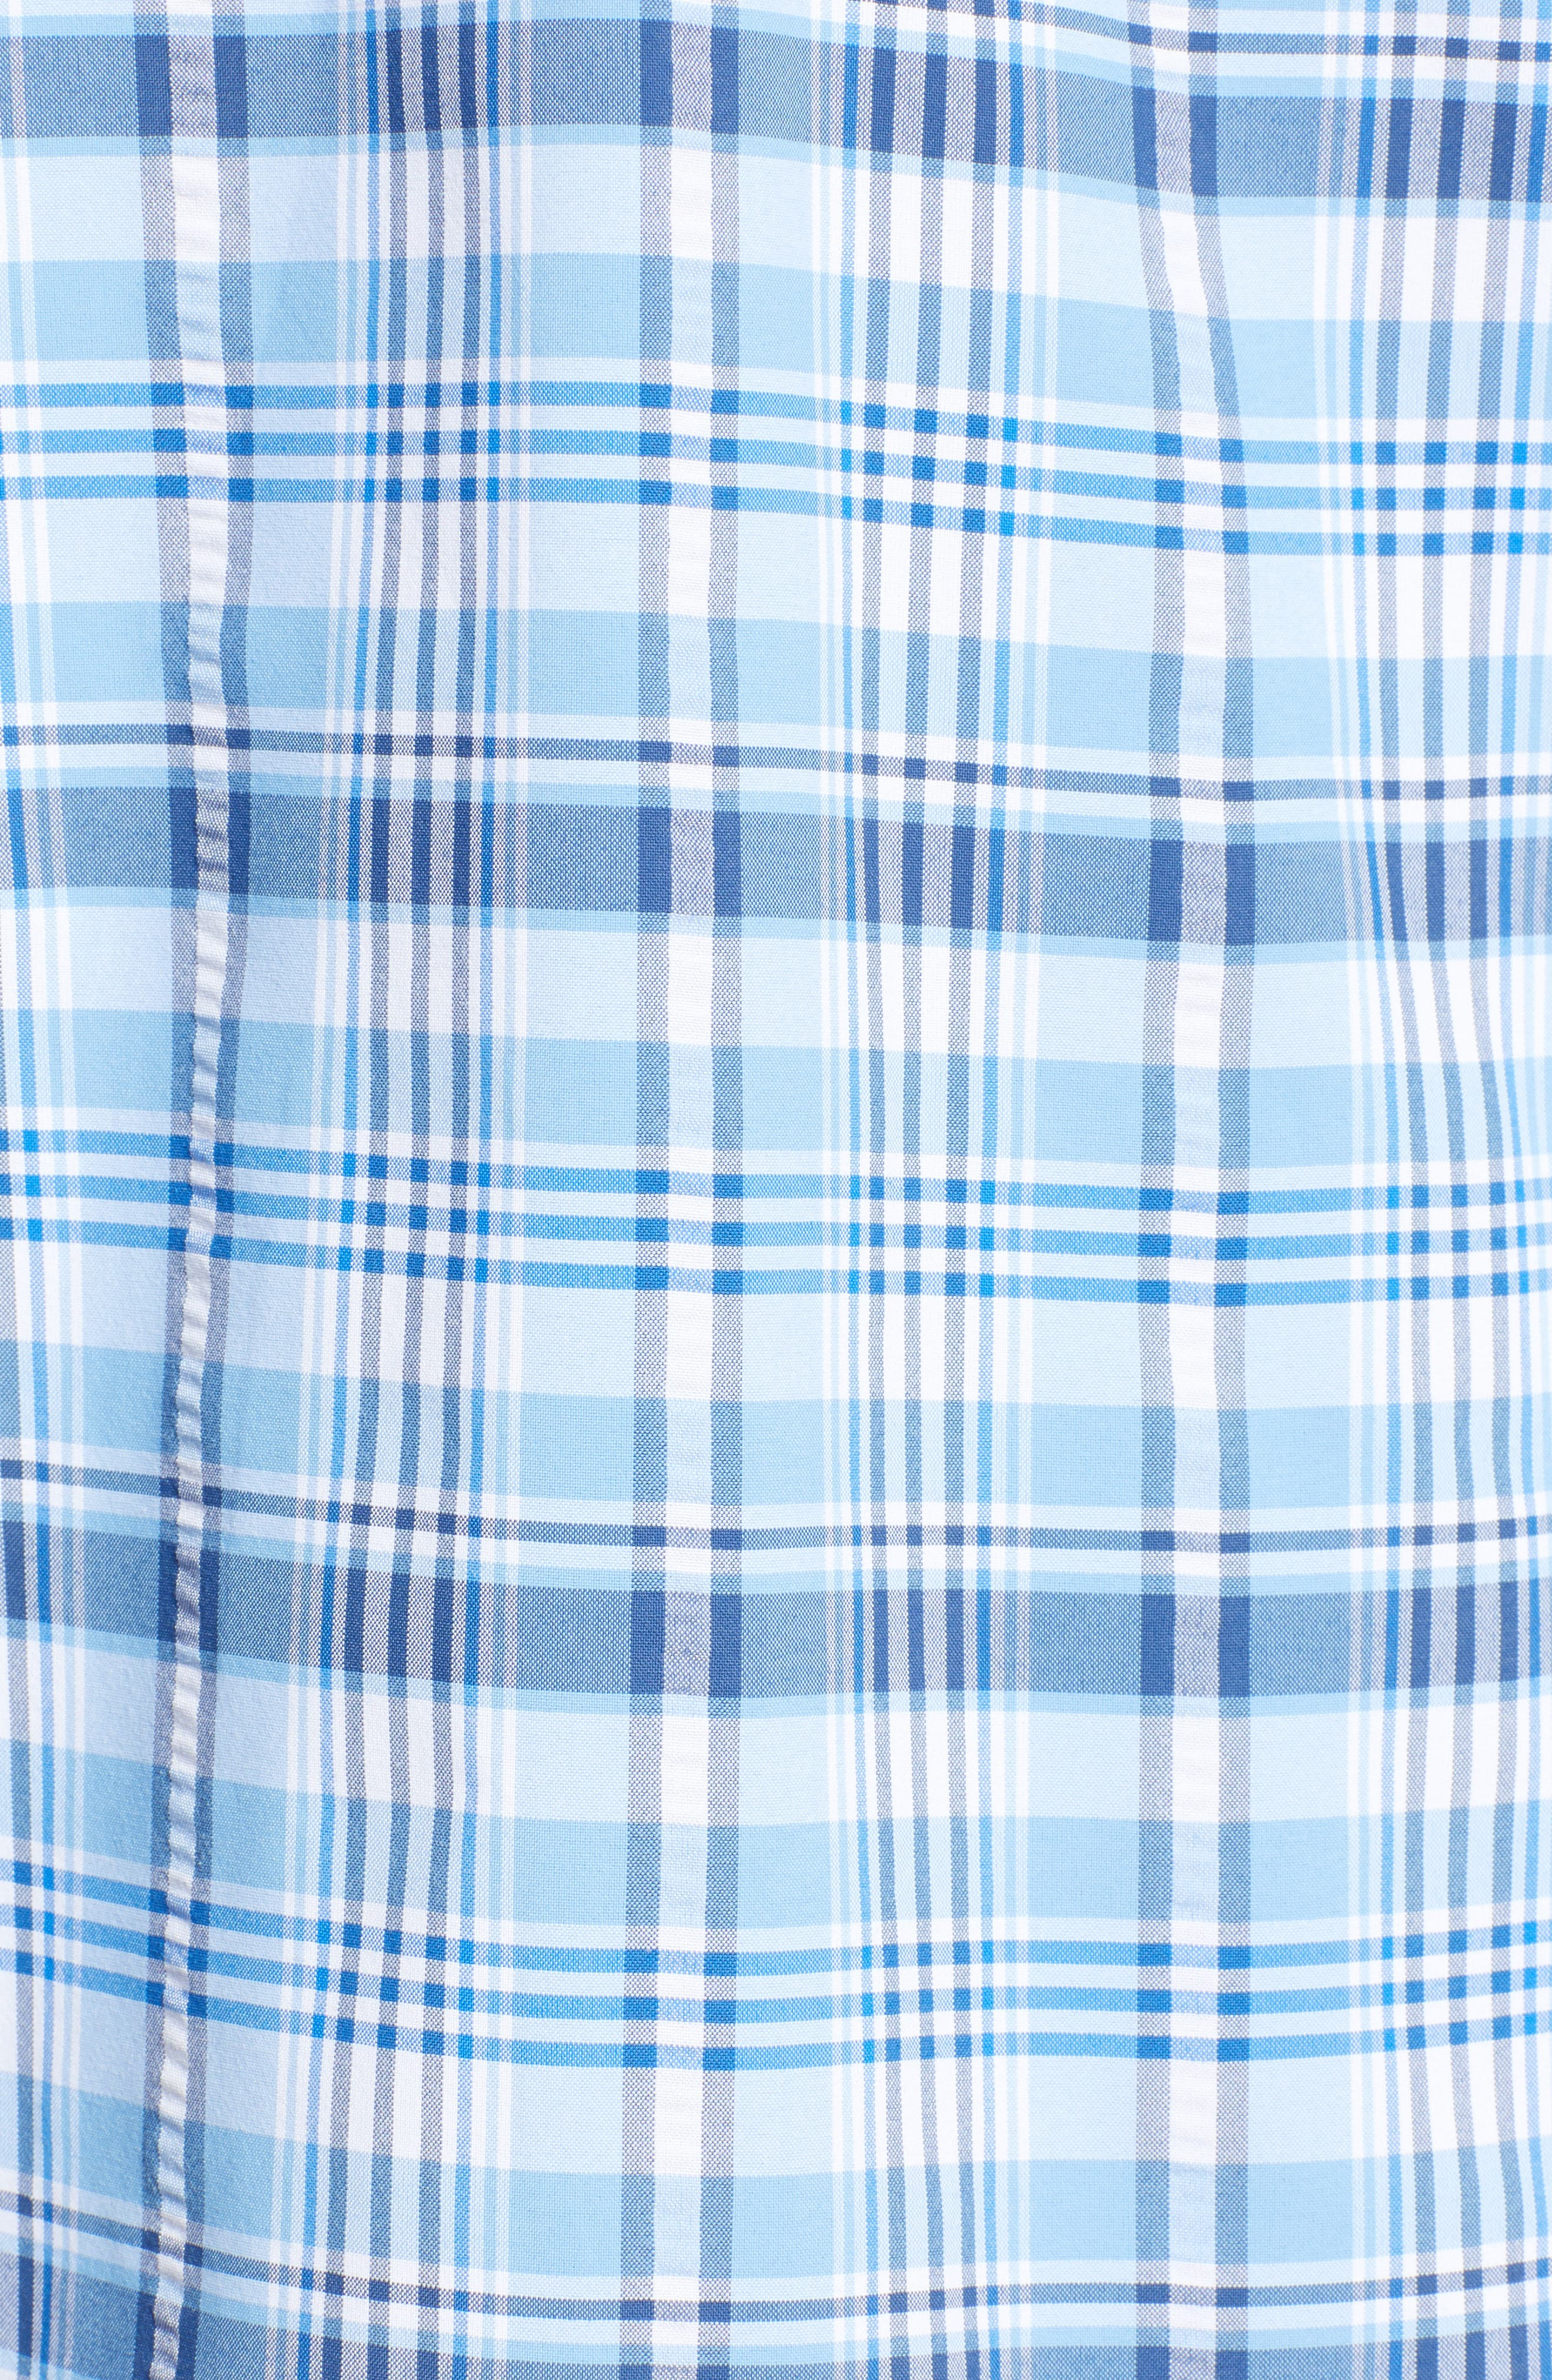 Prospect Hill Harbor Regular Fit Plaid Performance Sport Shirt,                             Alternate thumbnail 5, color,                             Ocean Breeze